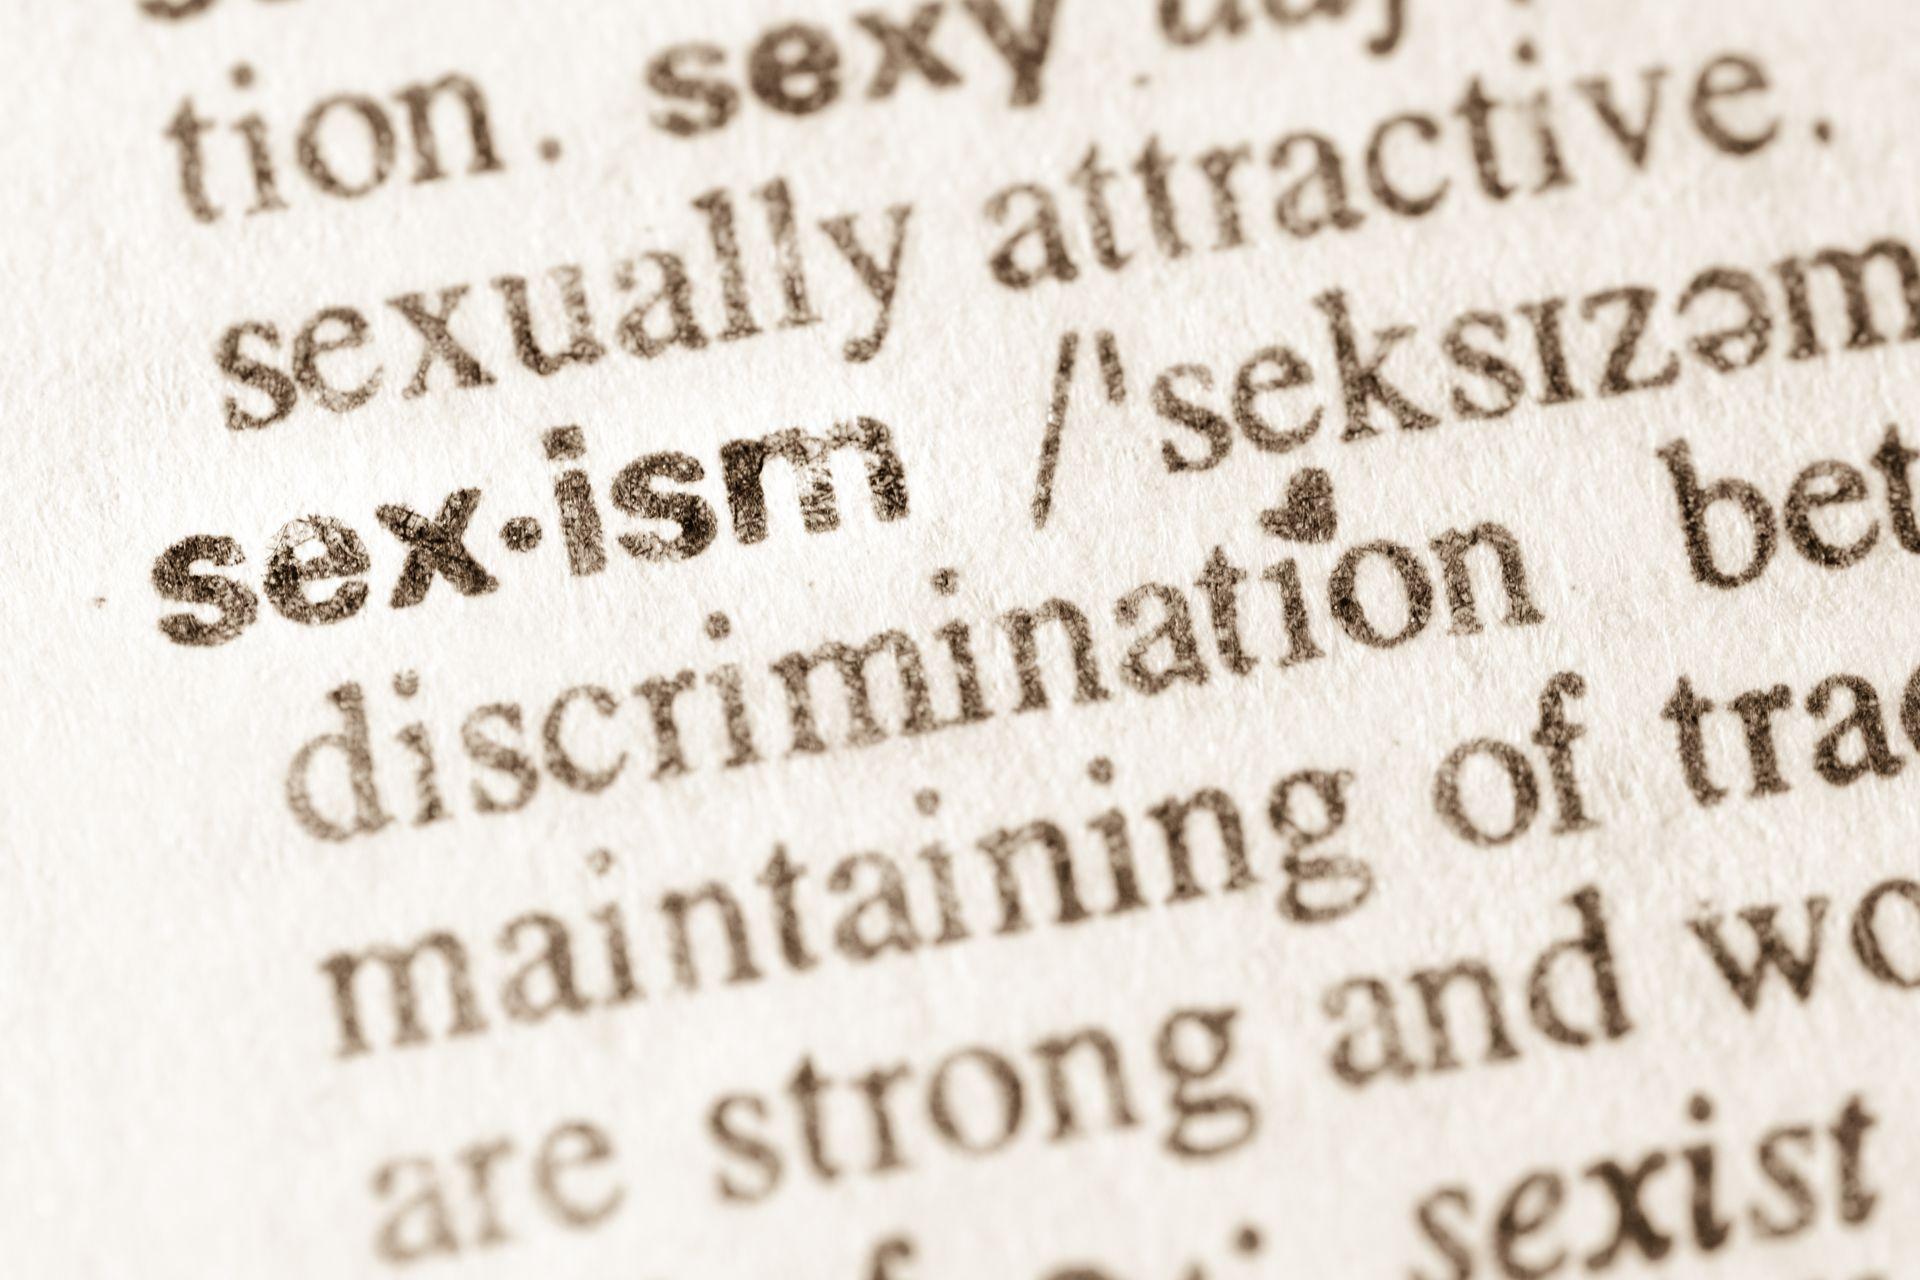 dictionarysexism.0.0